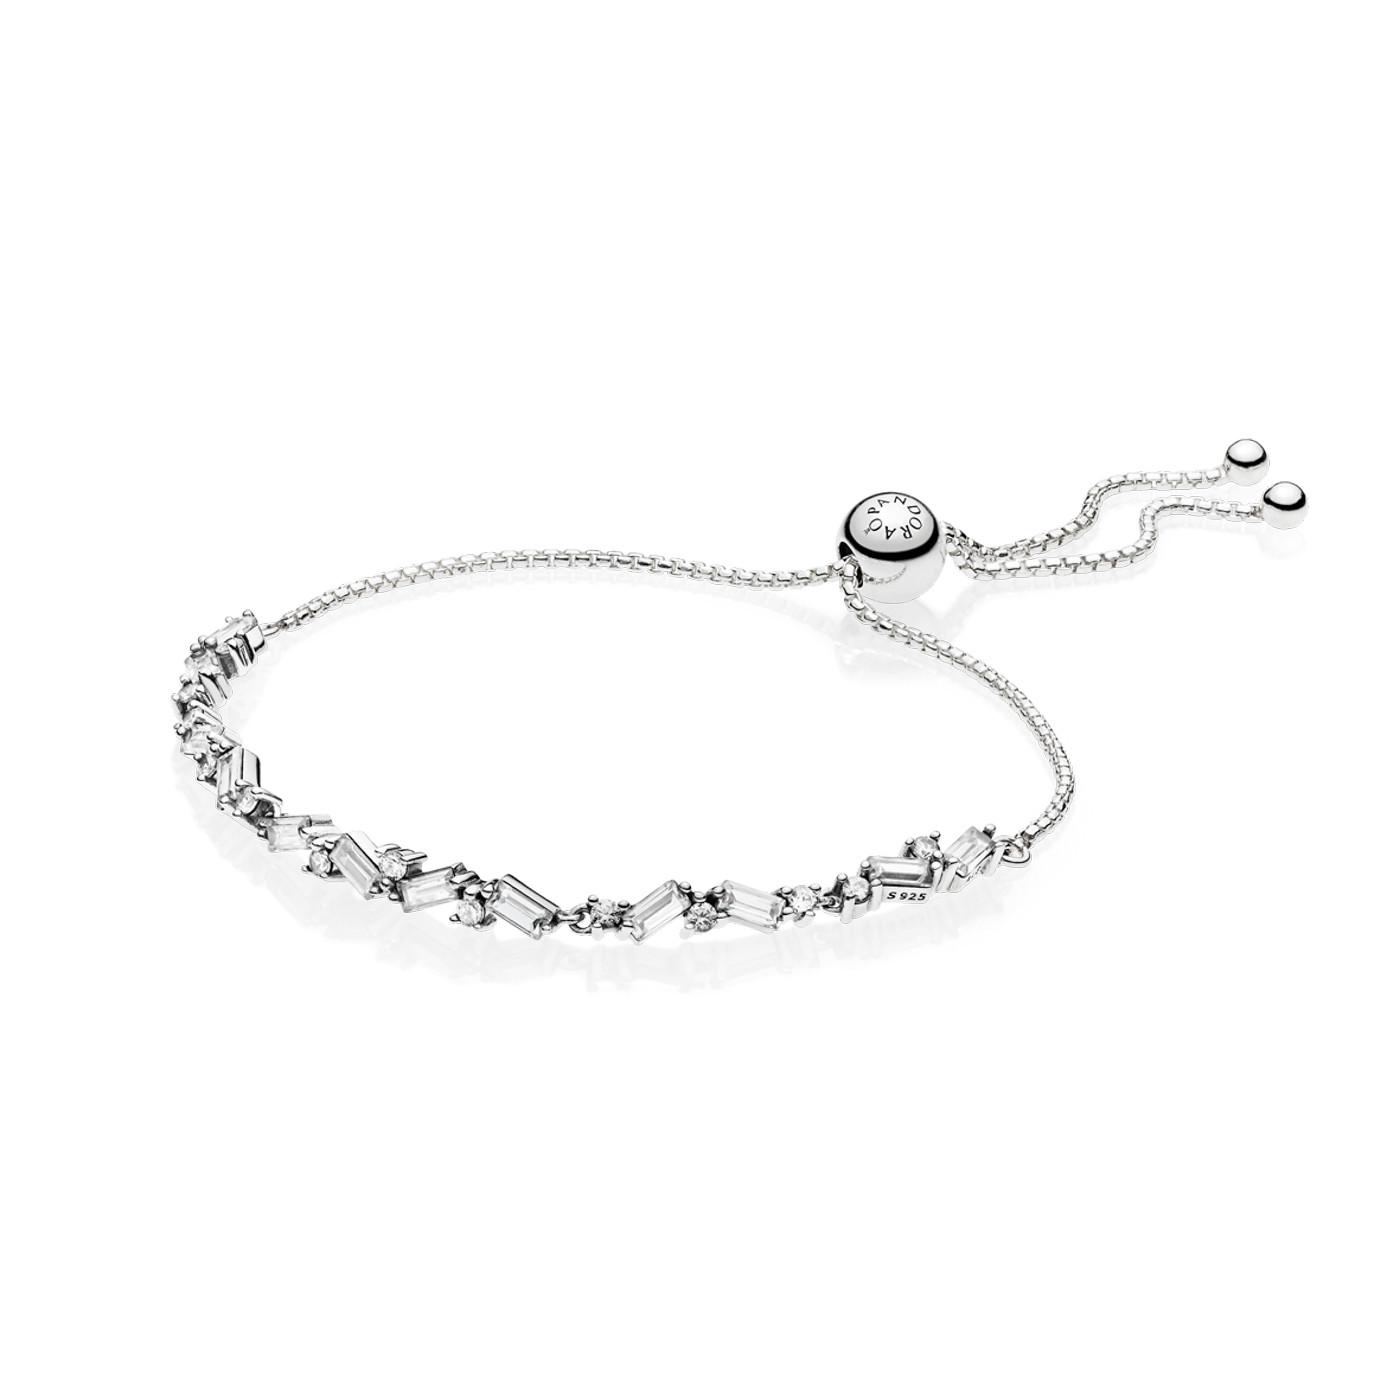 Pandora bracelet 597558CZ (Size: 23-25 cm)